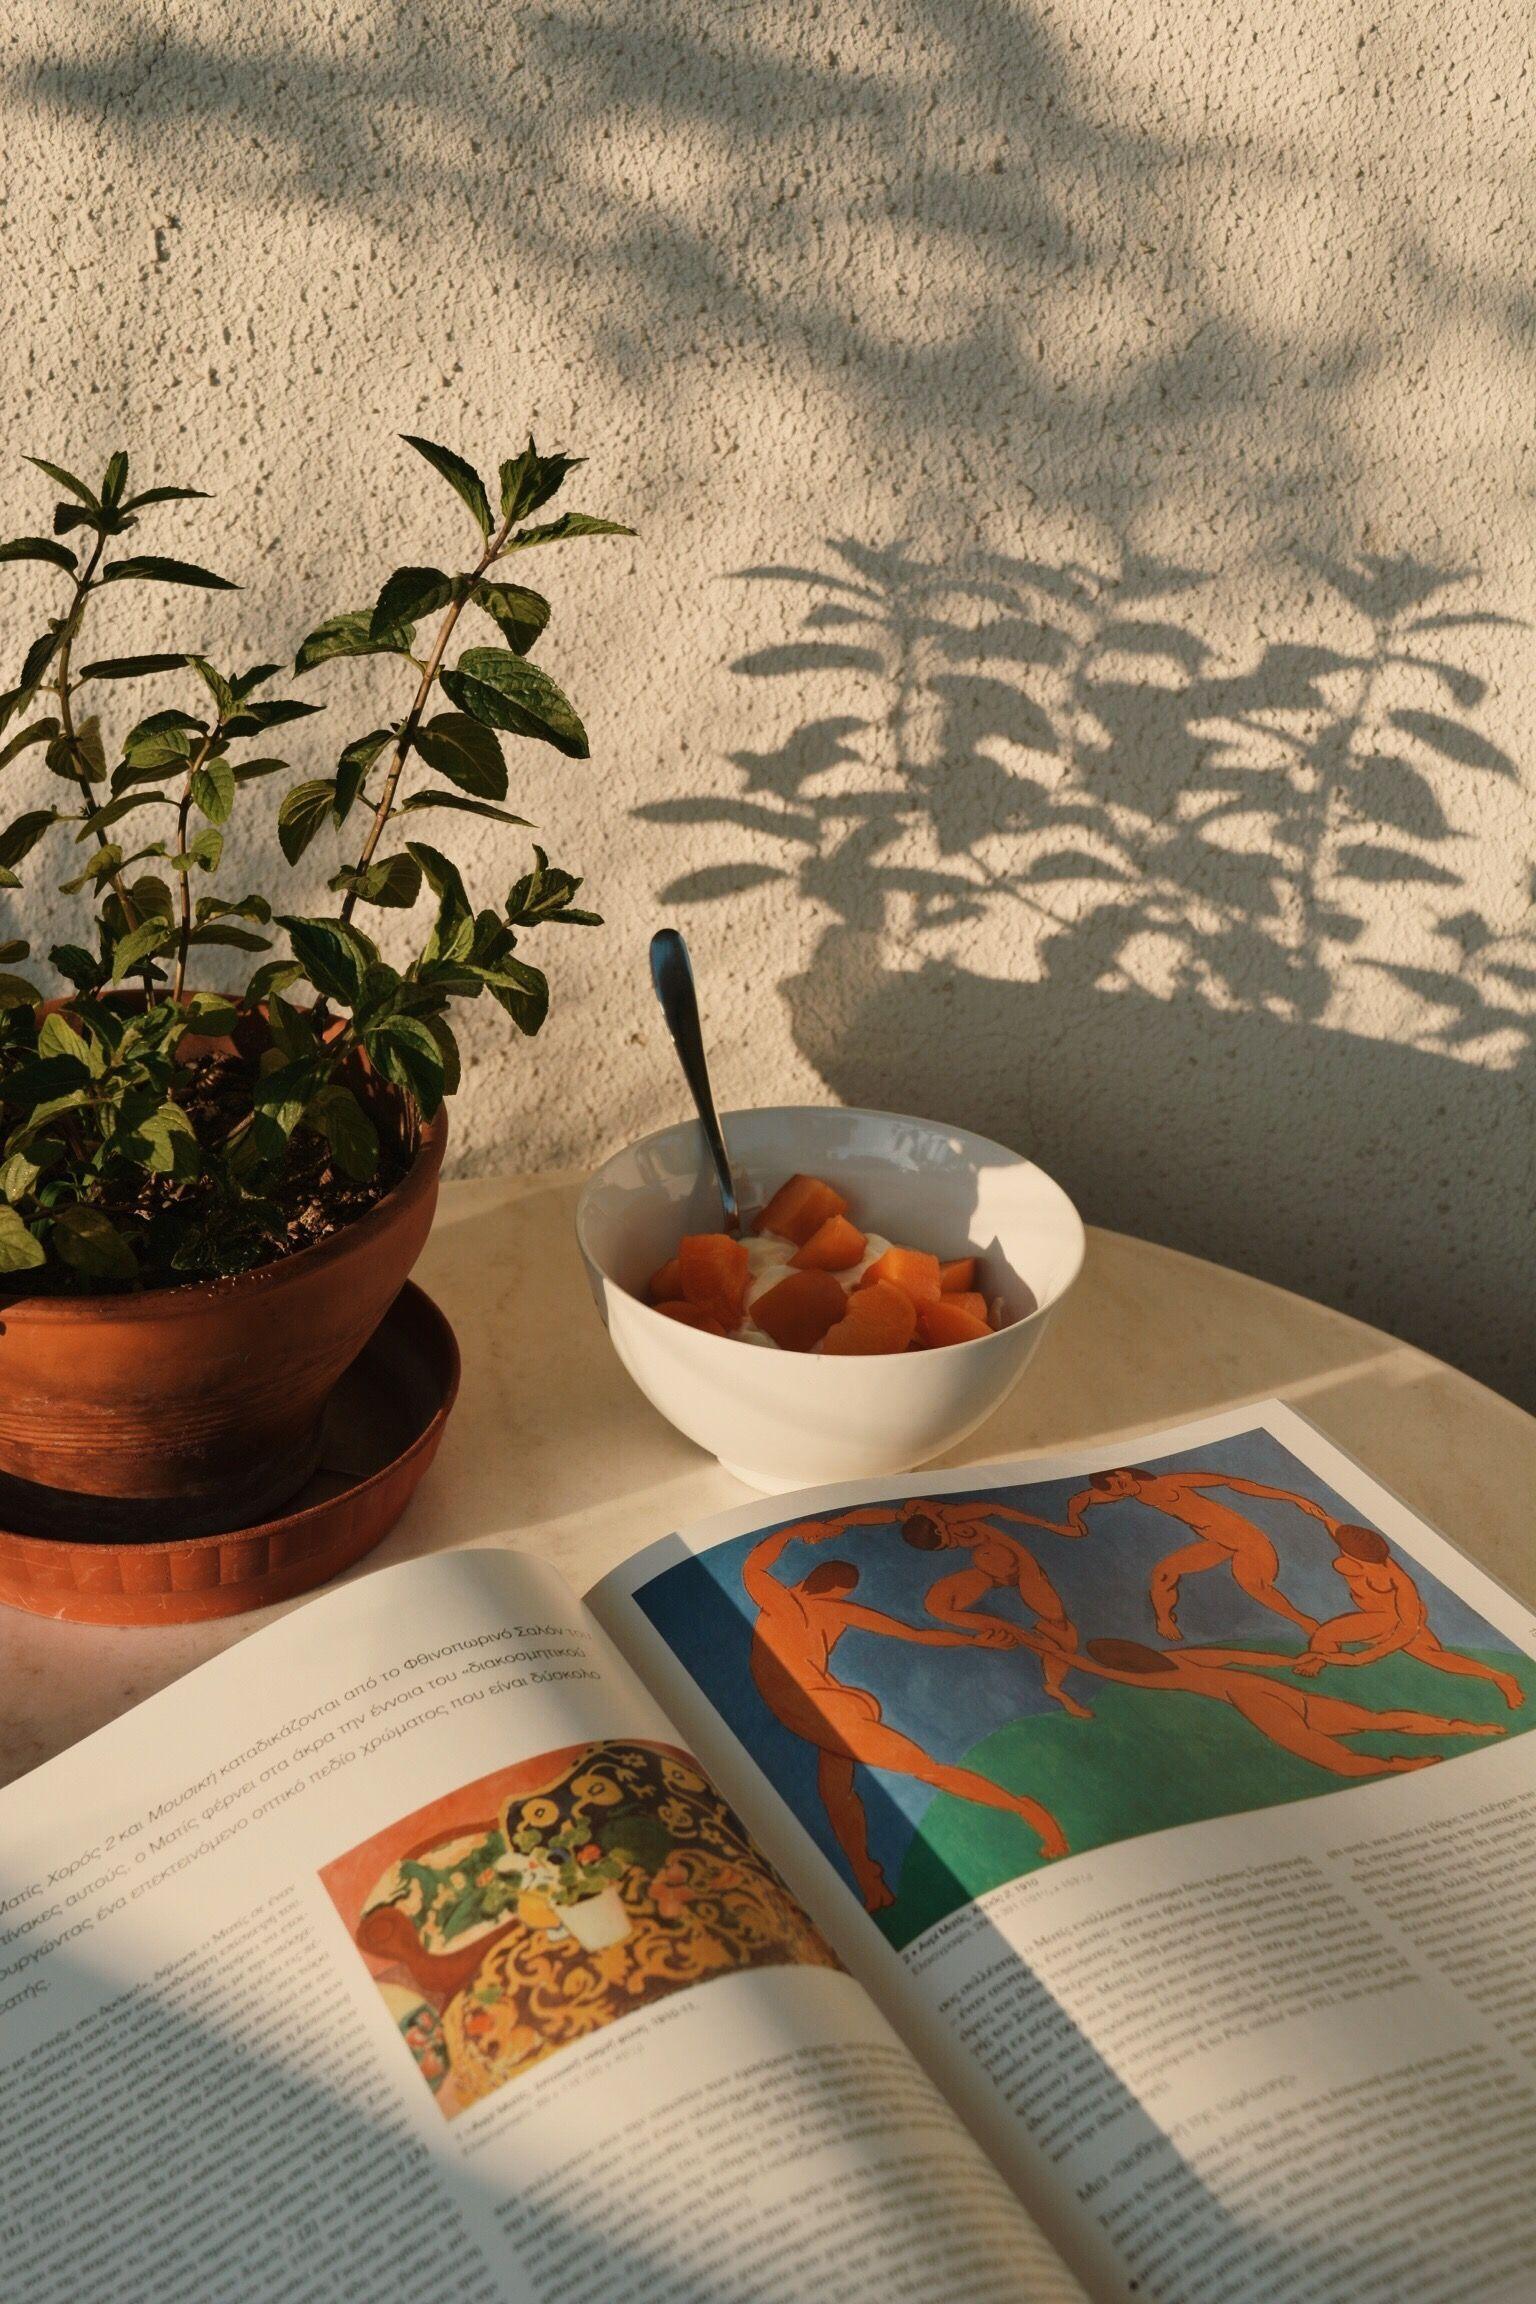 kendraalexandra | Summer aesthetic, Student art, Aesthetic